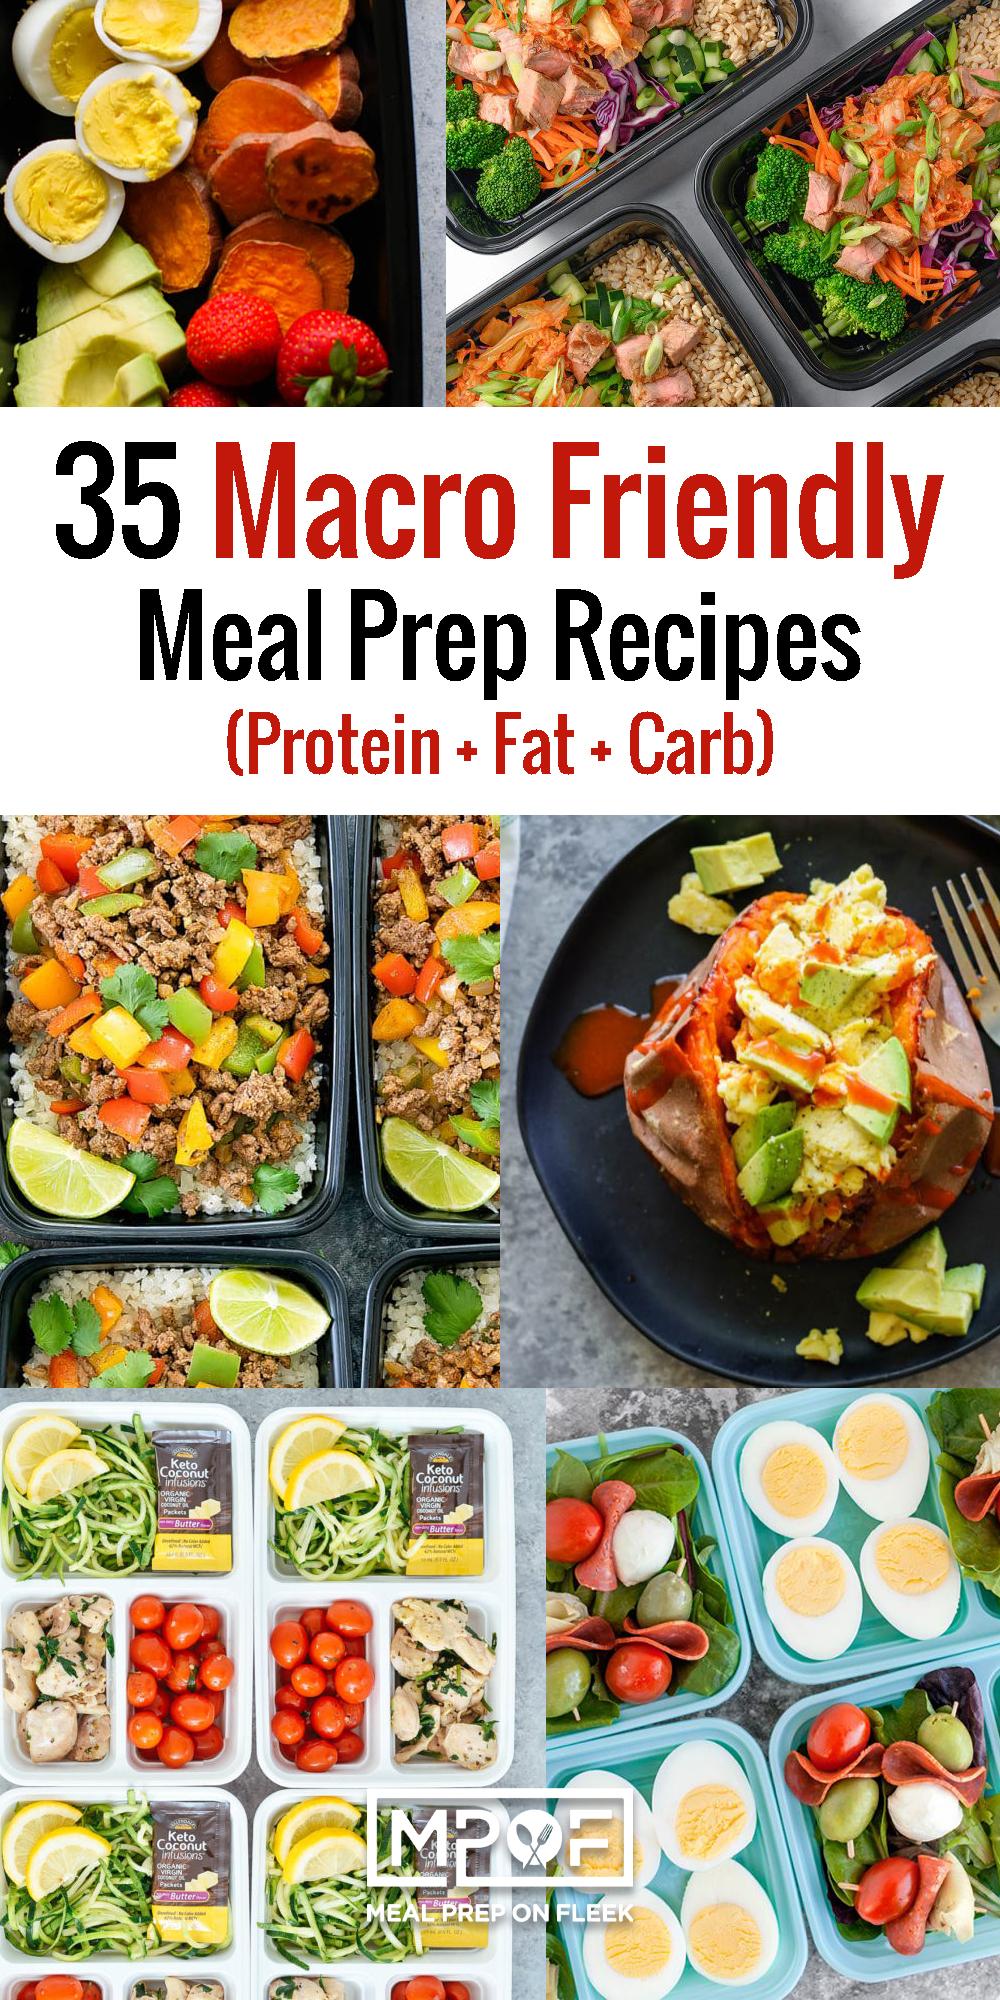 35 Macro Friendly Meal Prep Recipes